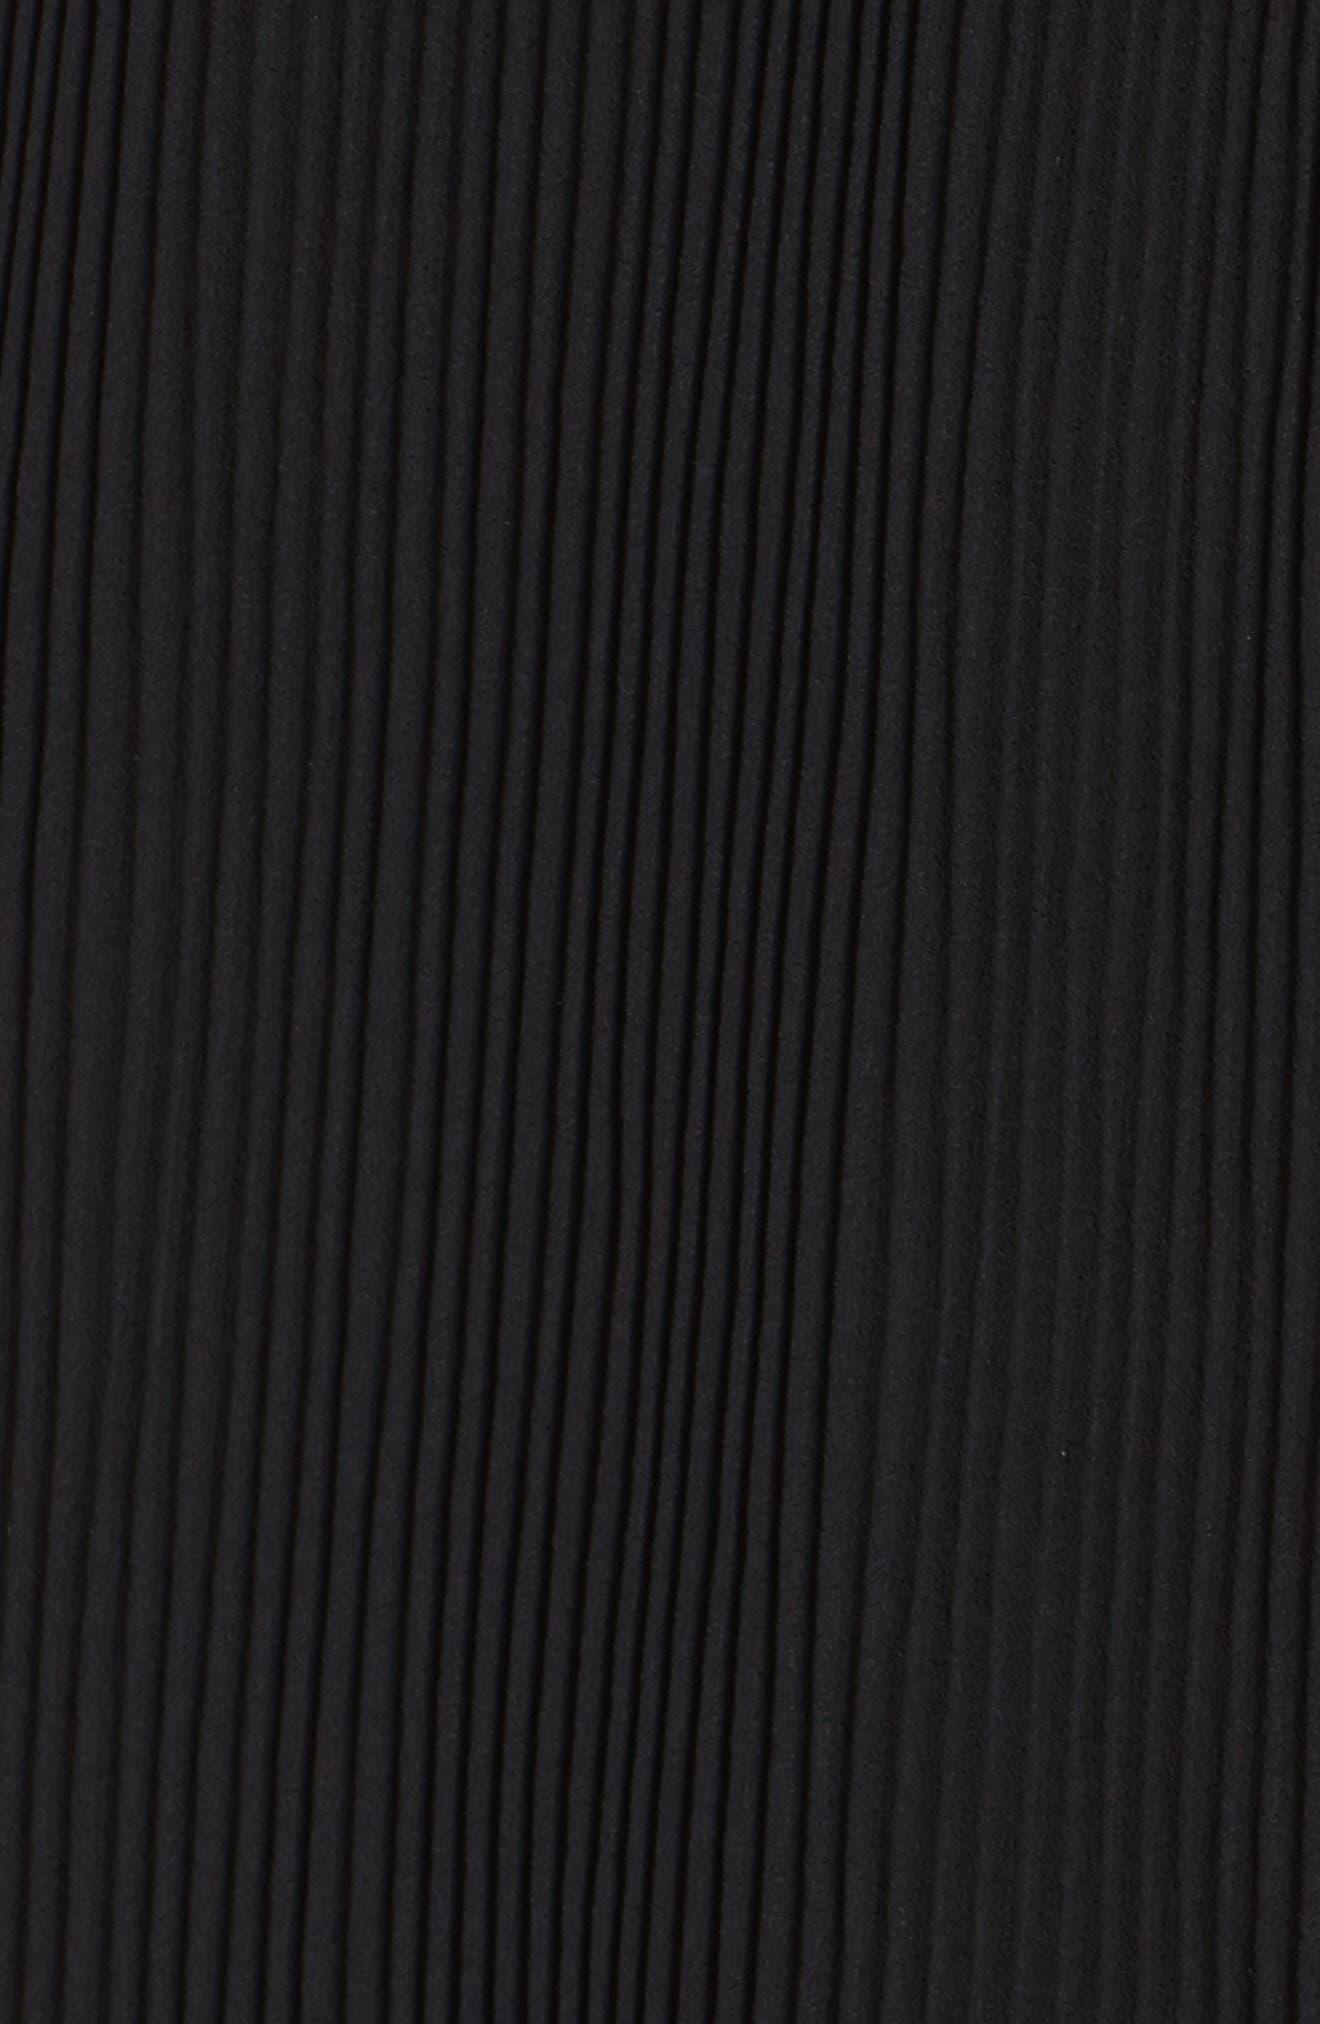 Tiered Midi Dress,                             Alternate thumbnail 5, color,                             001